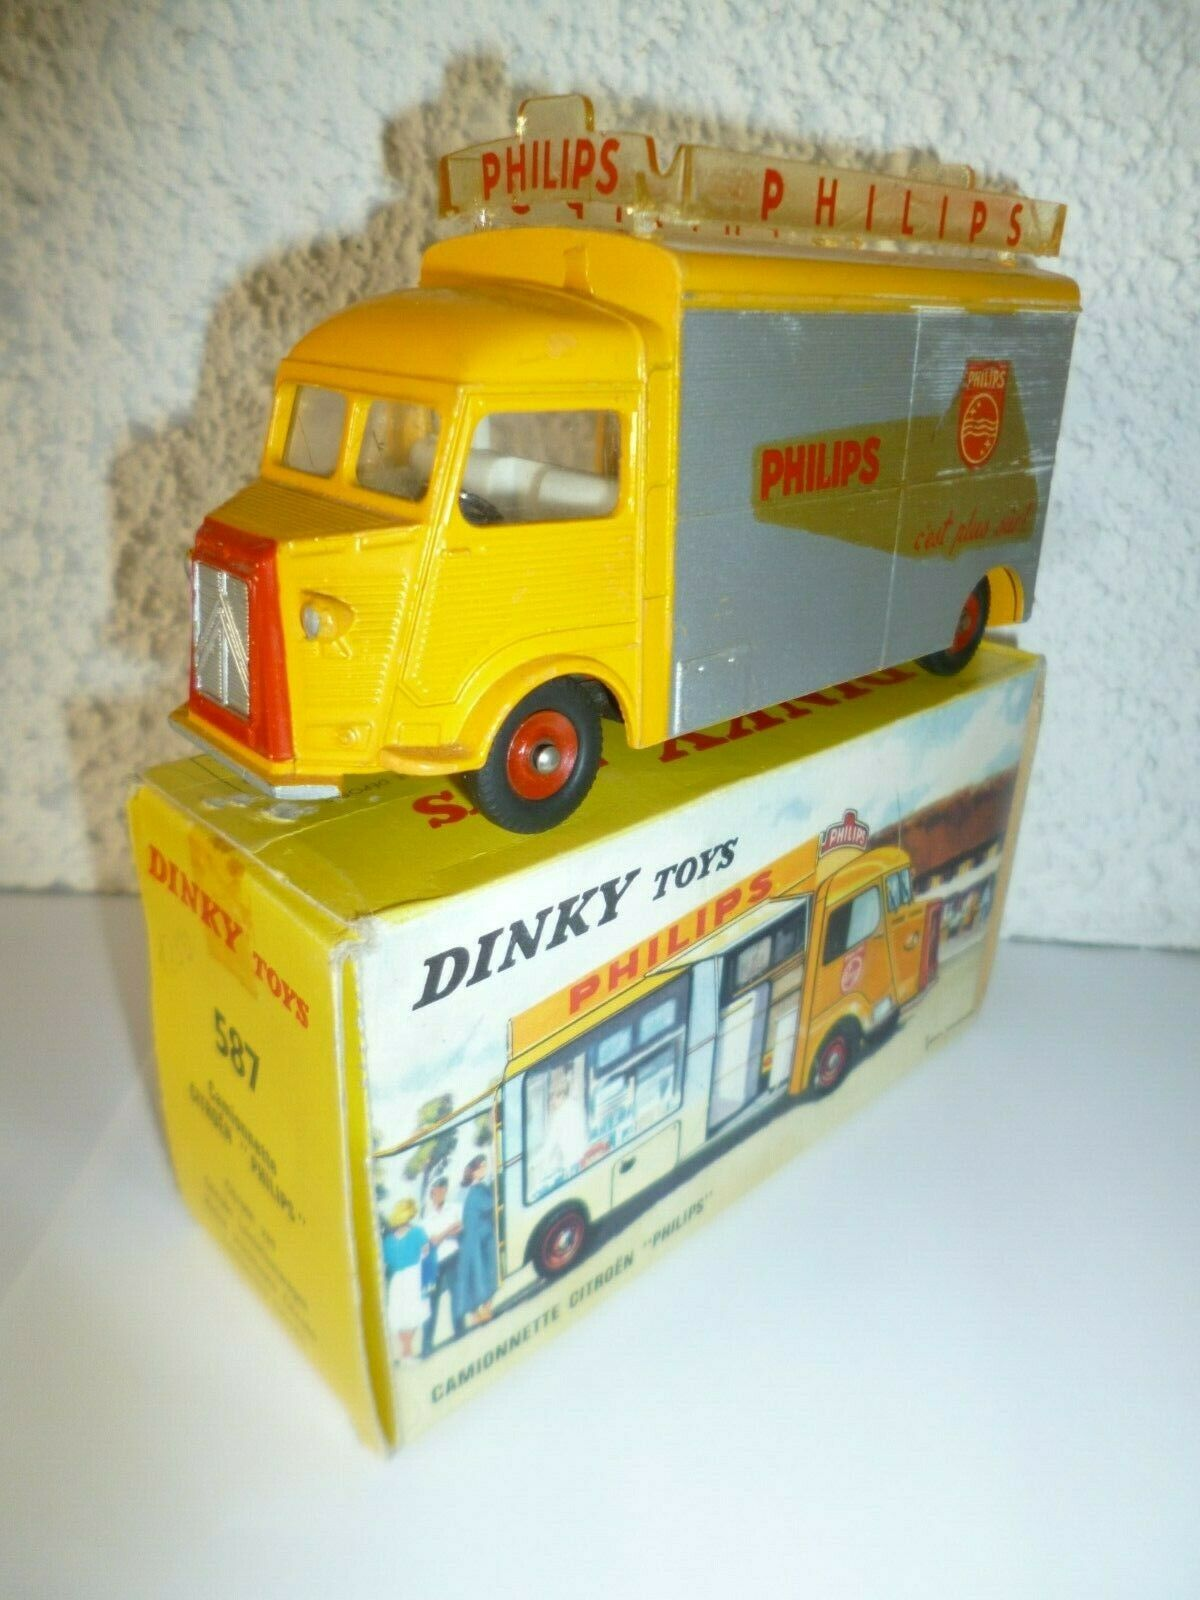 Citroen Tube HY PHILIPS sa boite véritable Dinky Toys en bel état